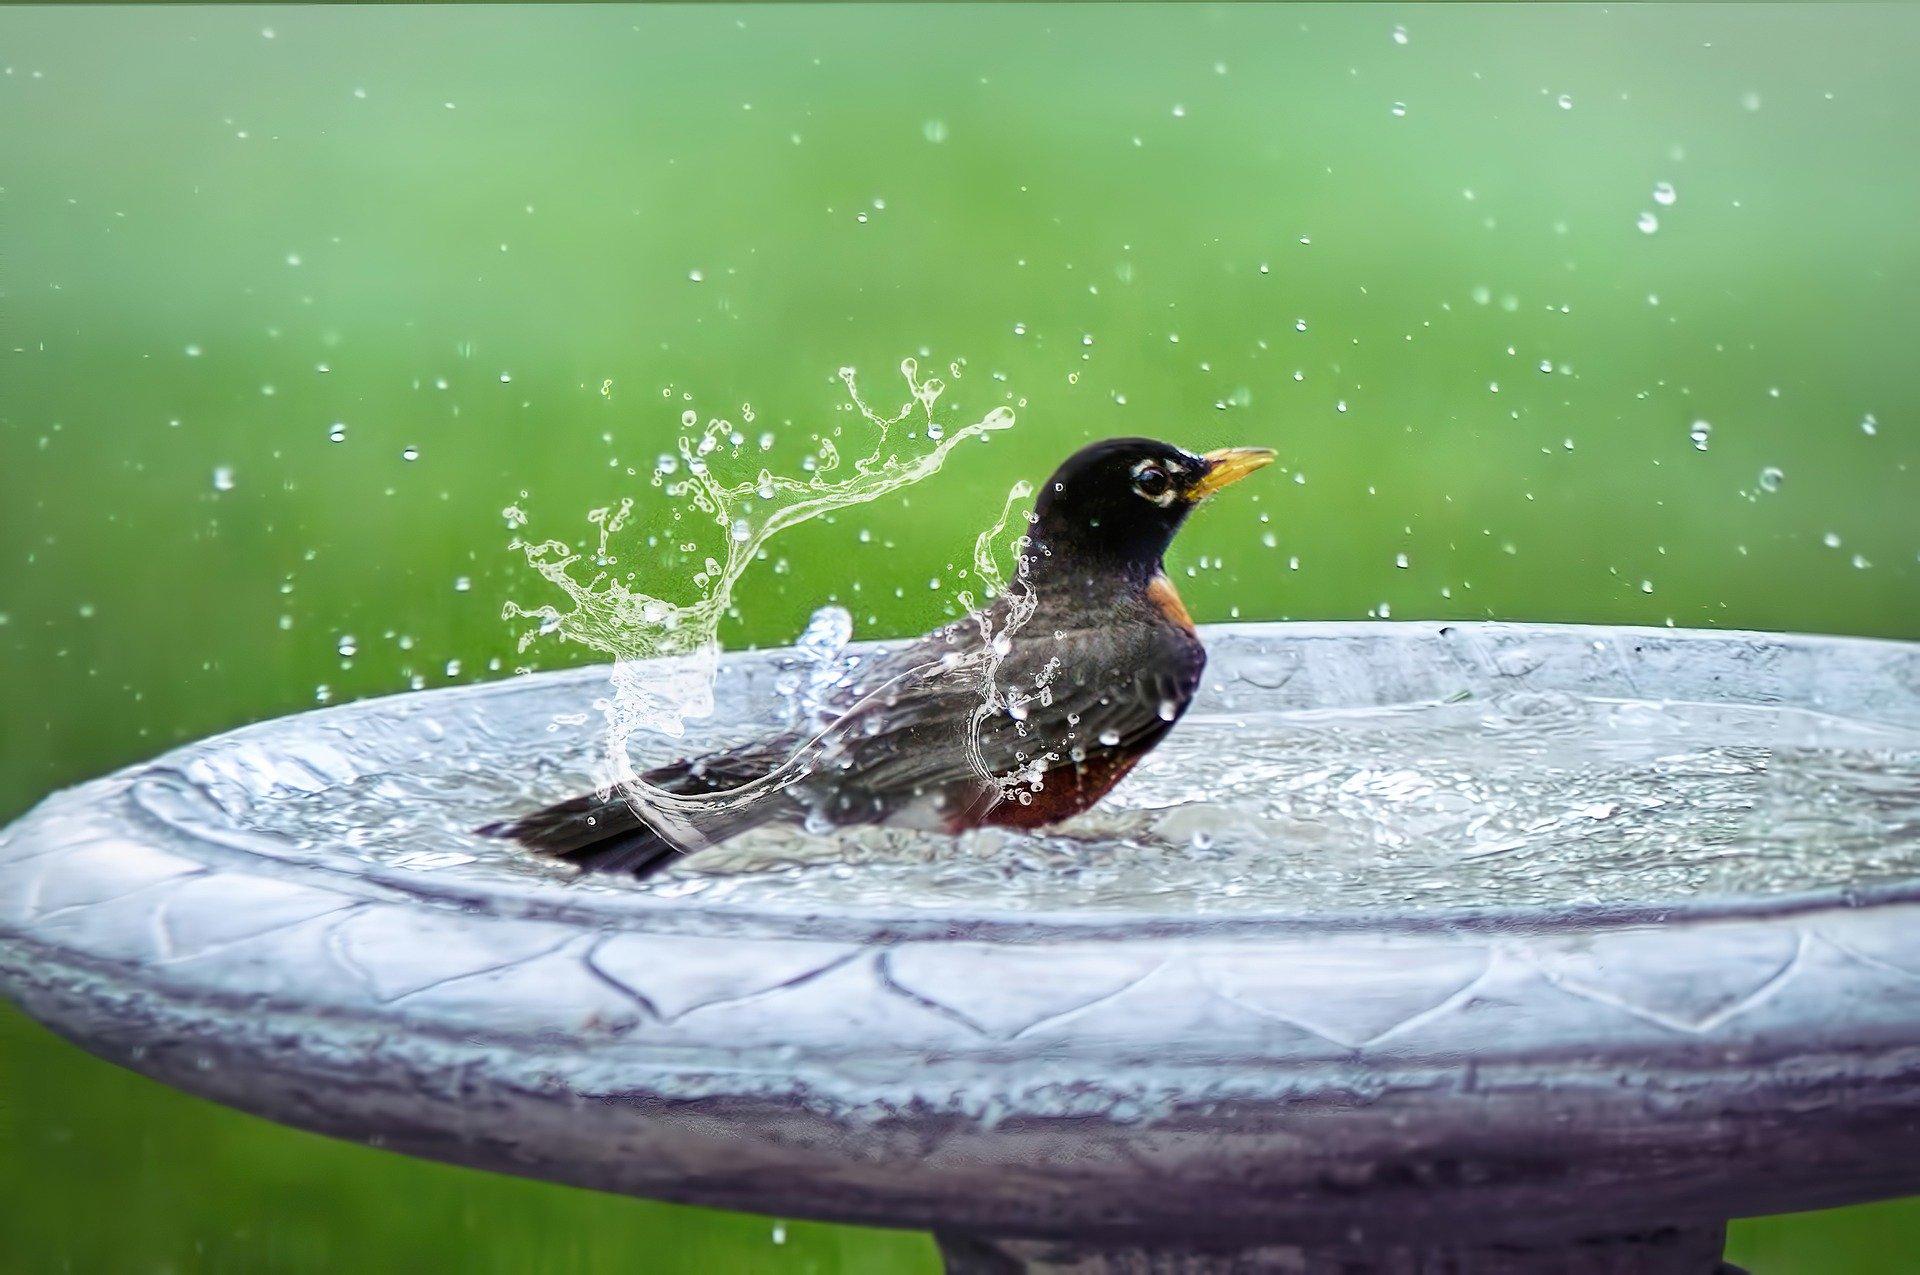 bird-bath-5290285_1920